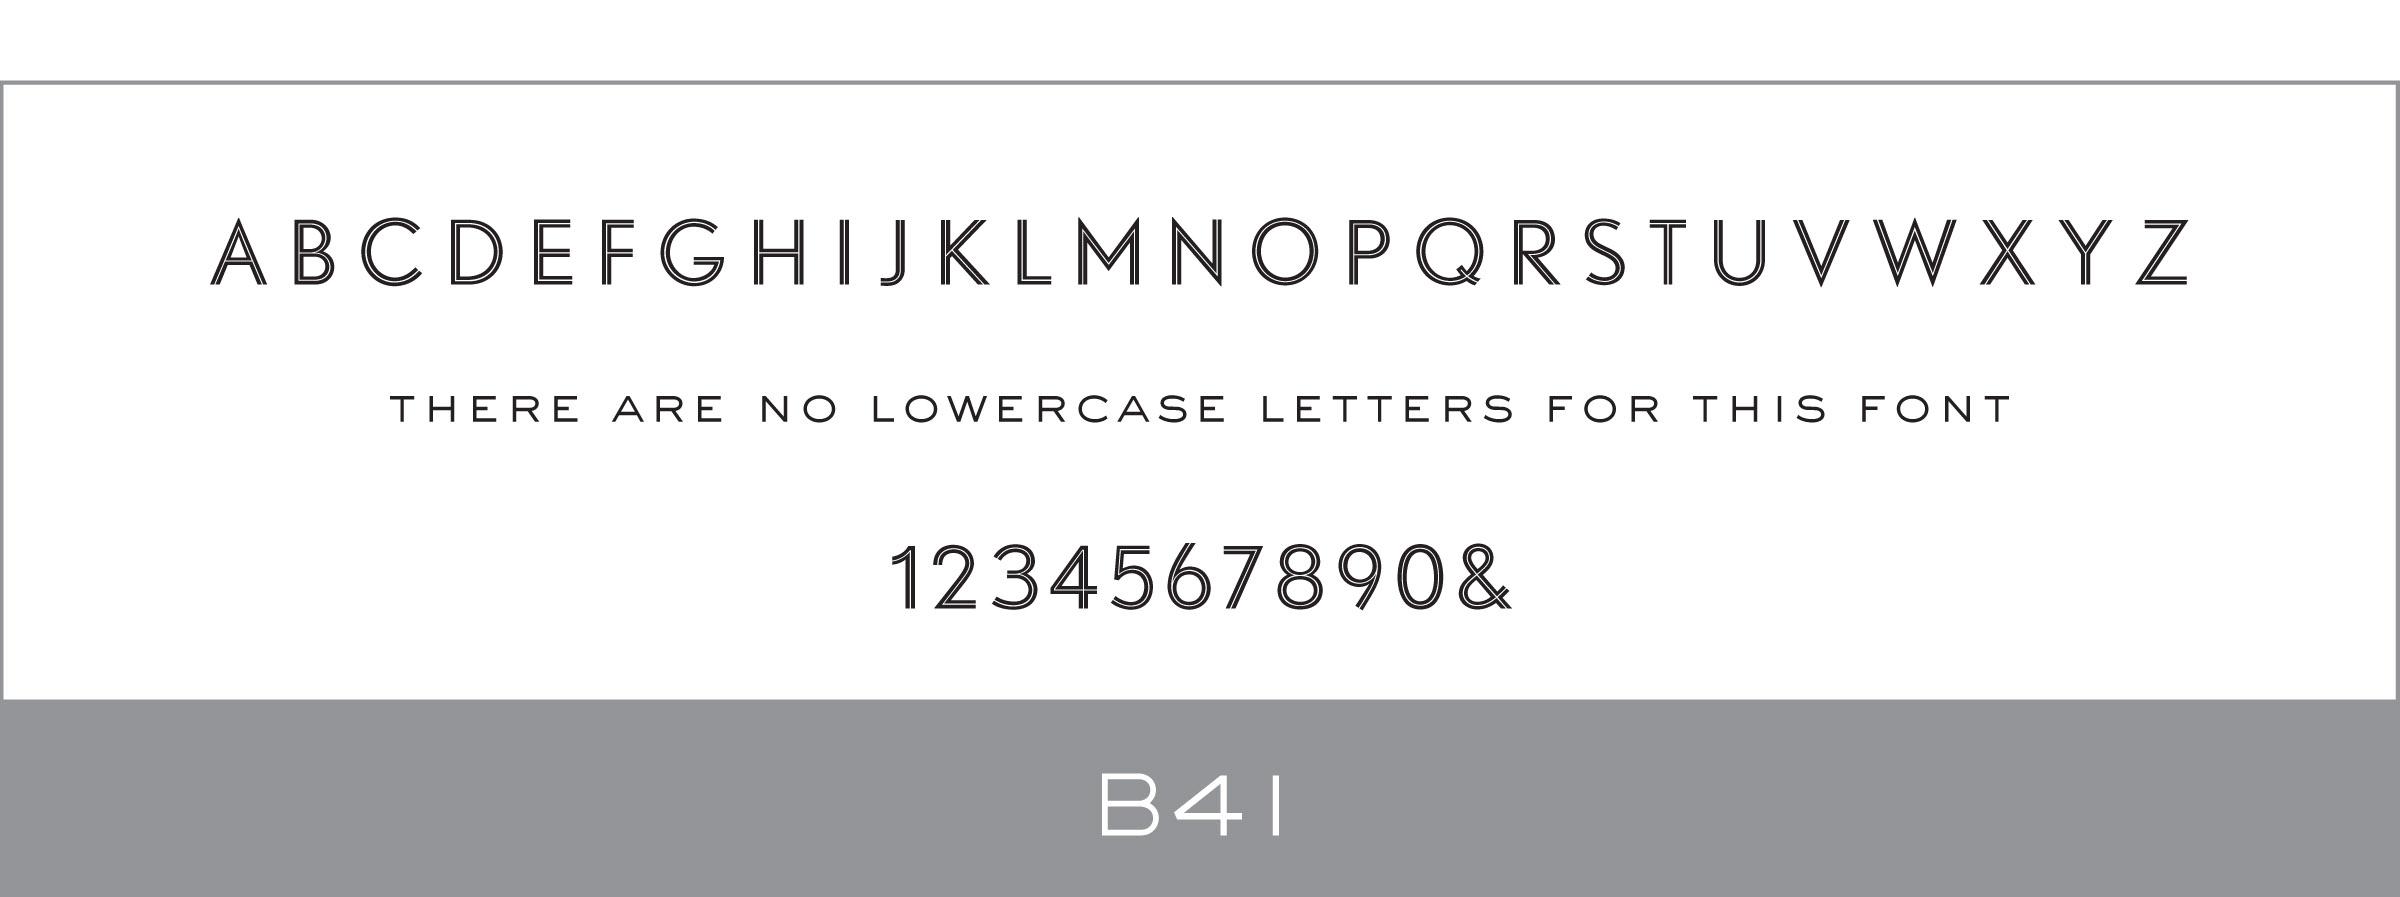 B41_Haute_Papier_Font.jpg